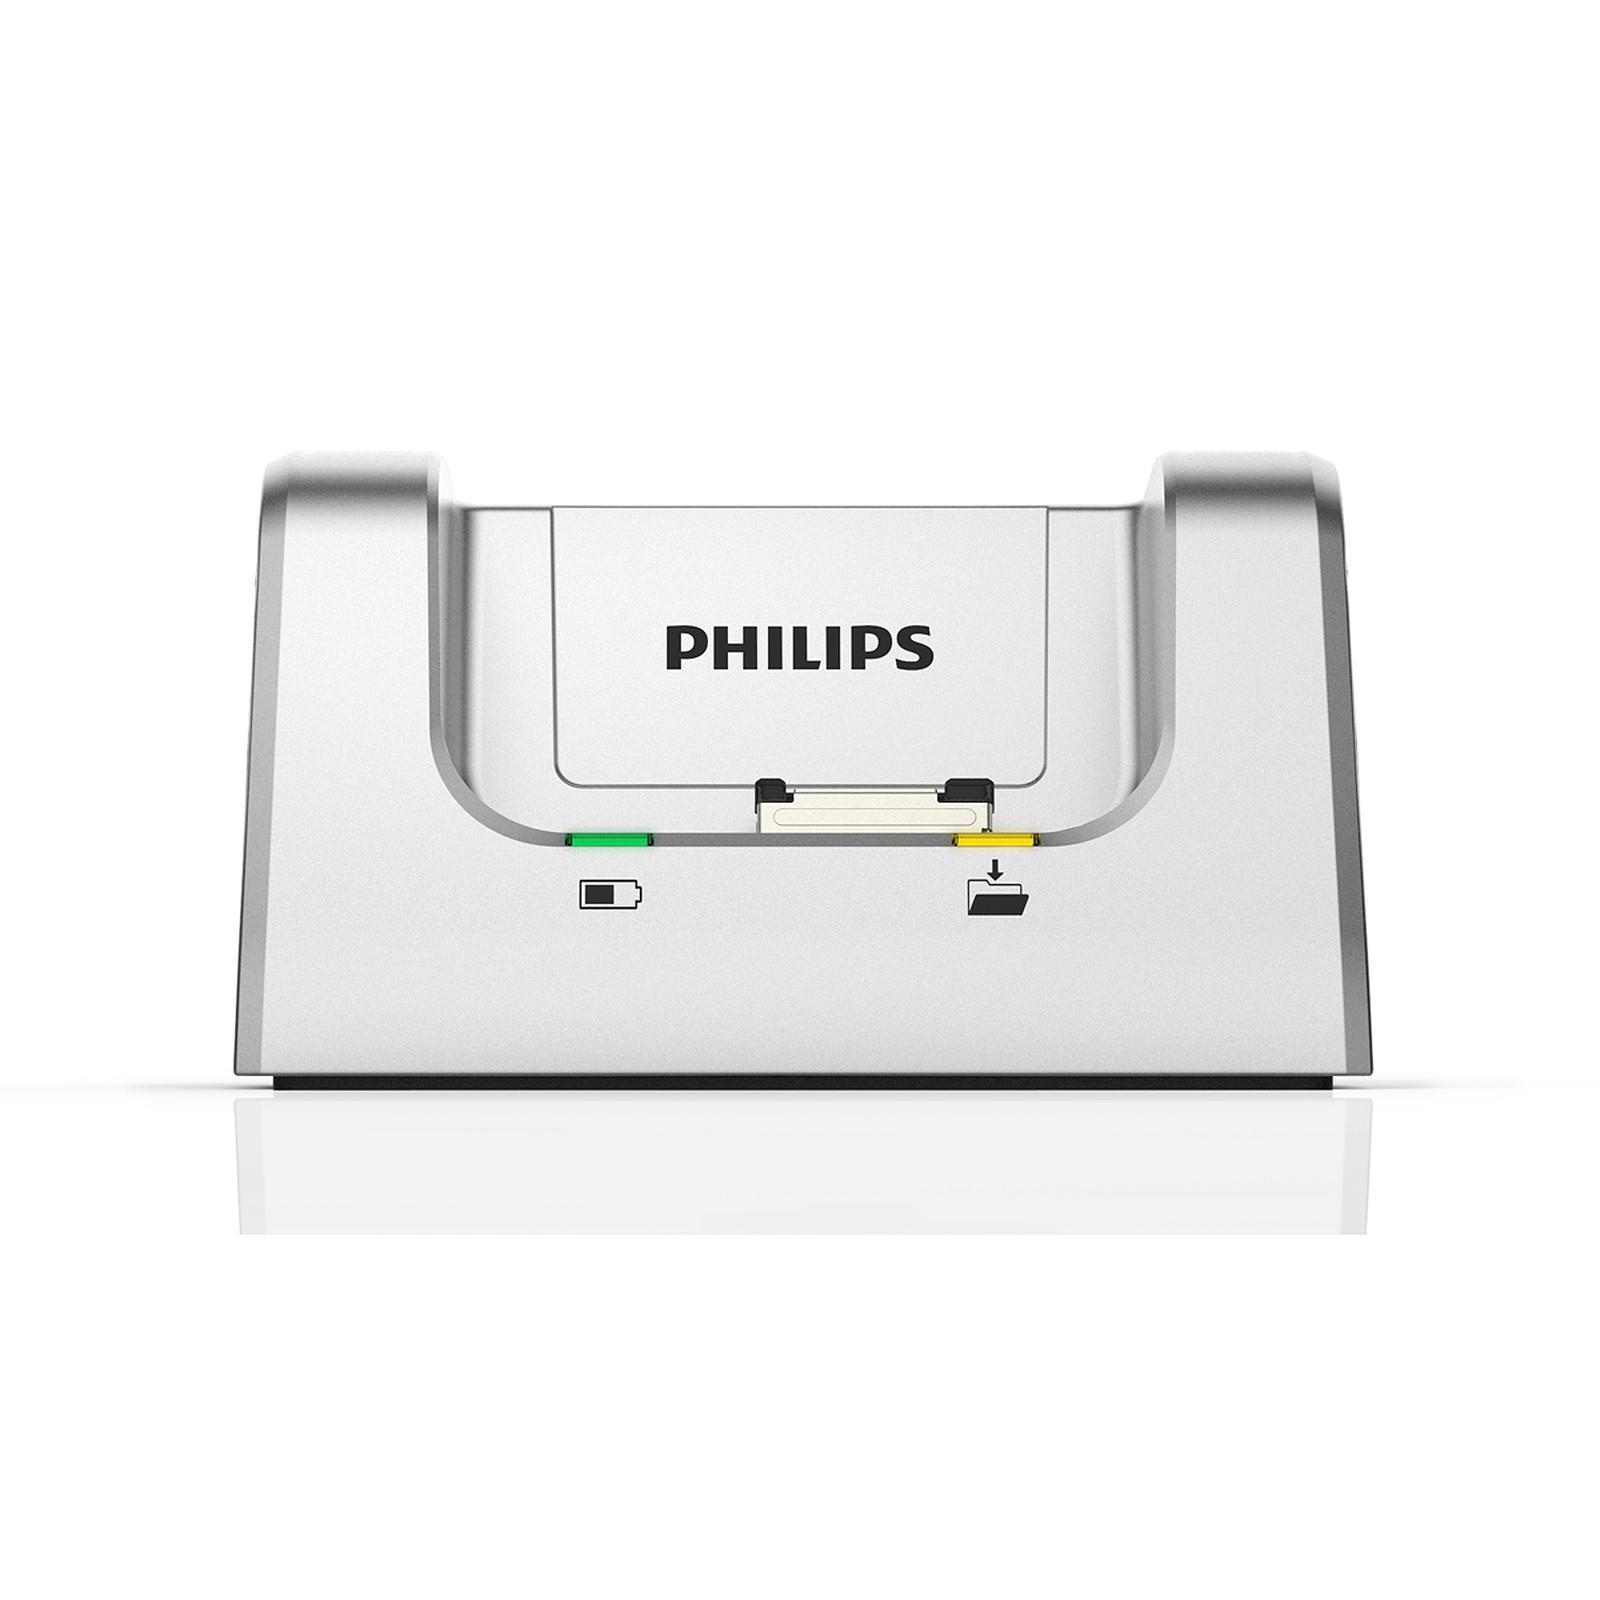 Philips ACC 8120